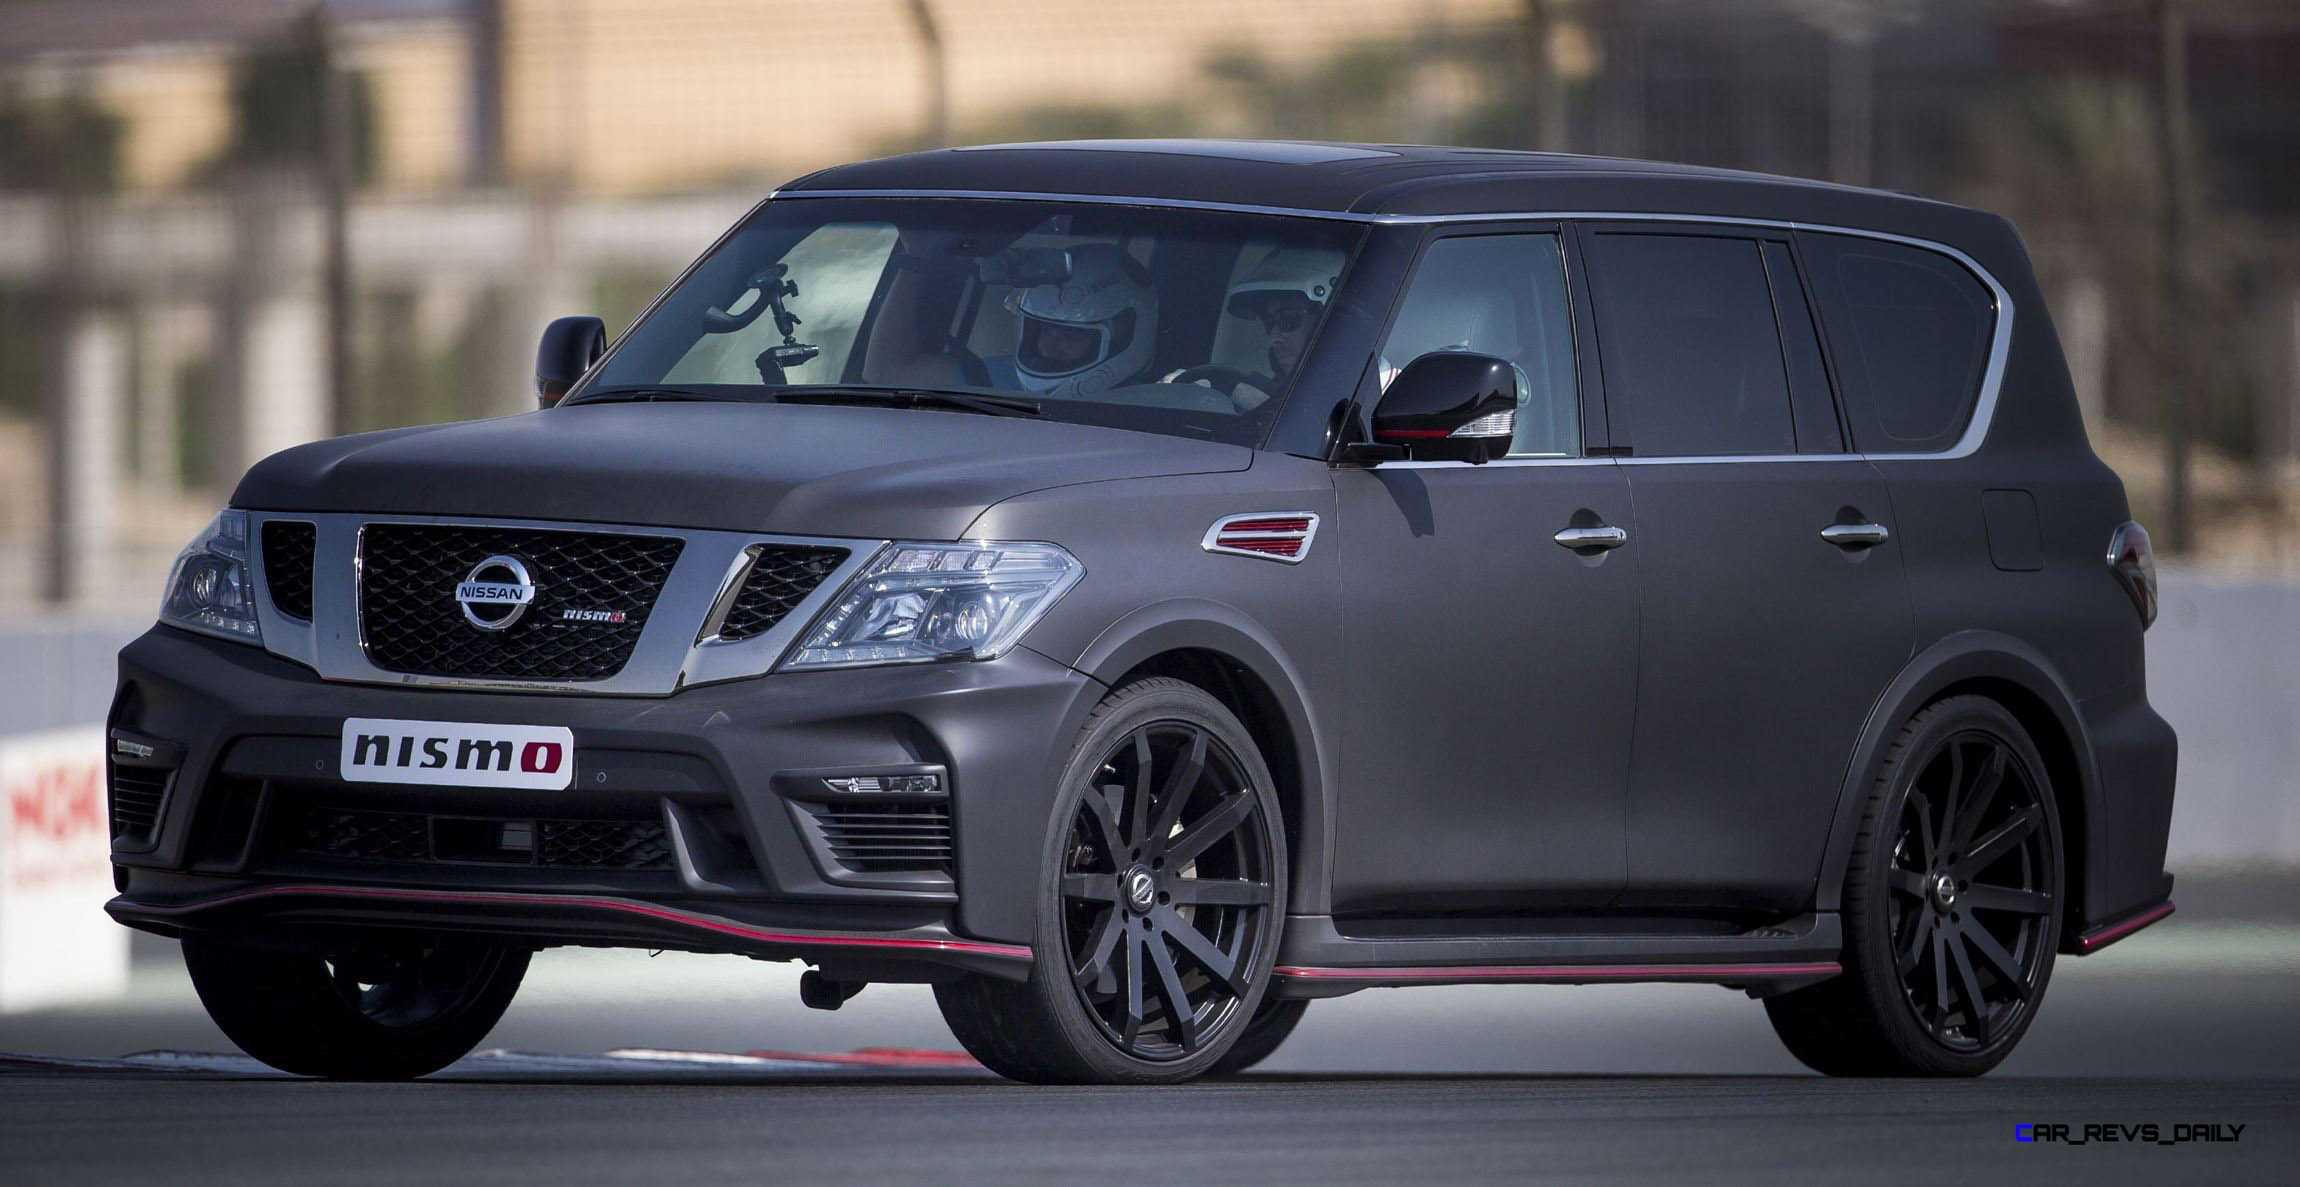 2016 Nissan Patrol Nismo Black 10